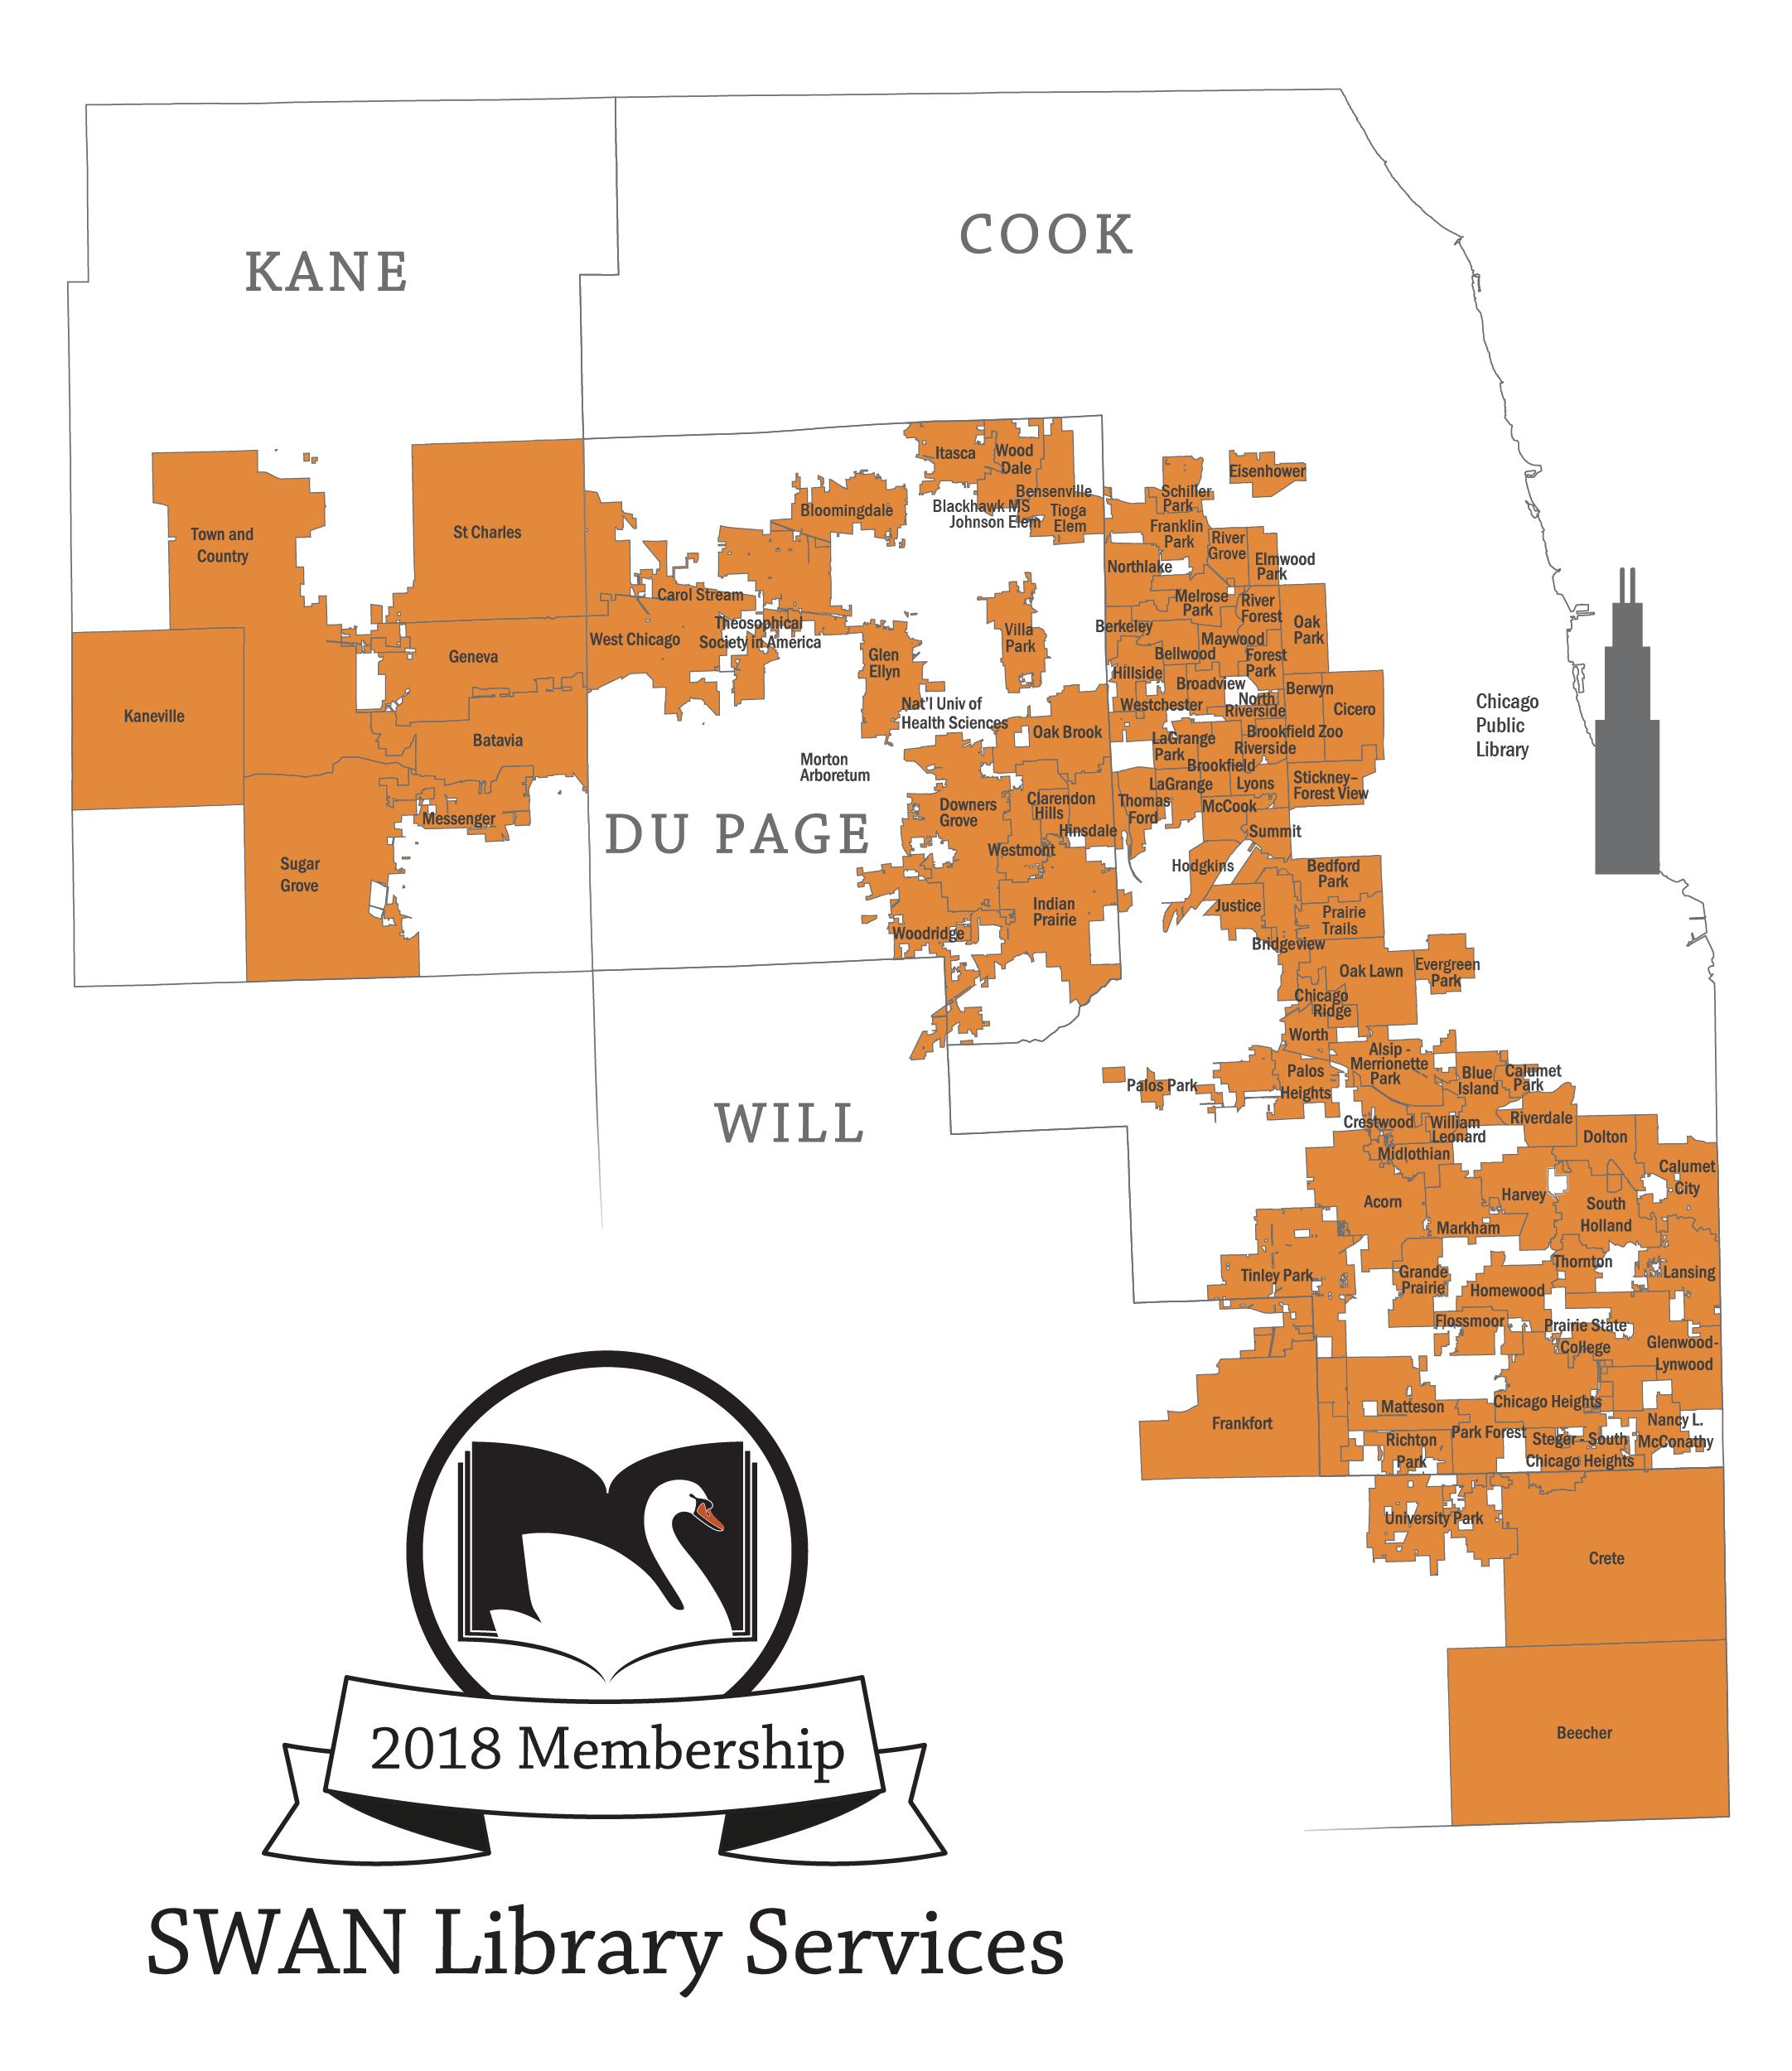 2018 Membership Map